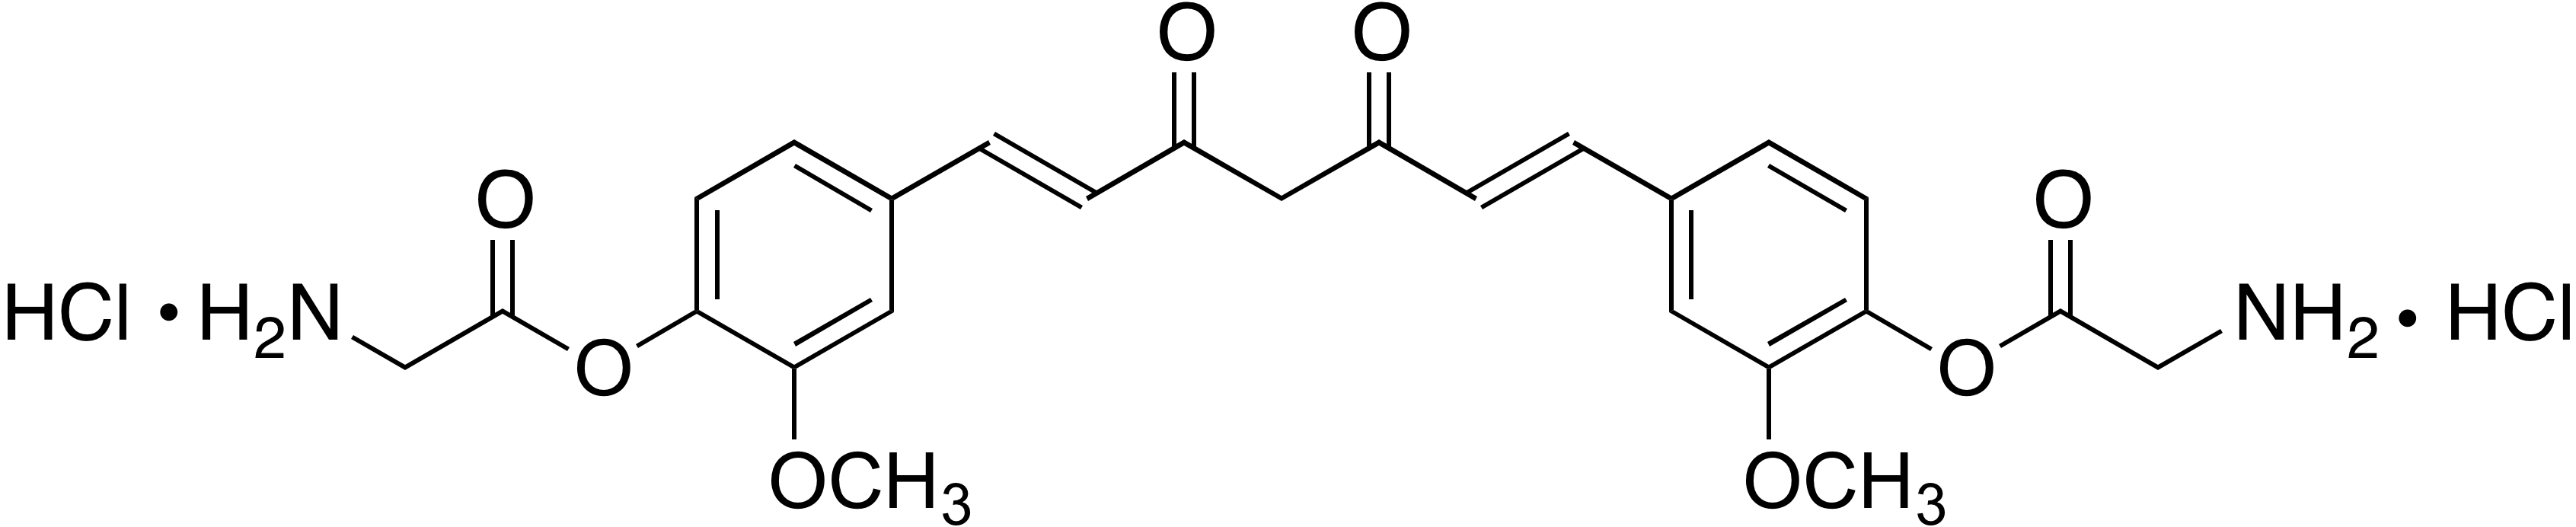 Di-O-glycinoylcurcumin dihydrochloride